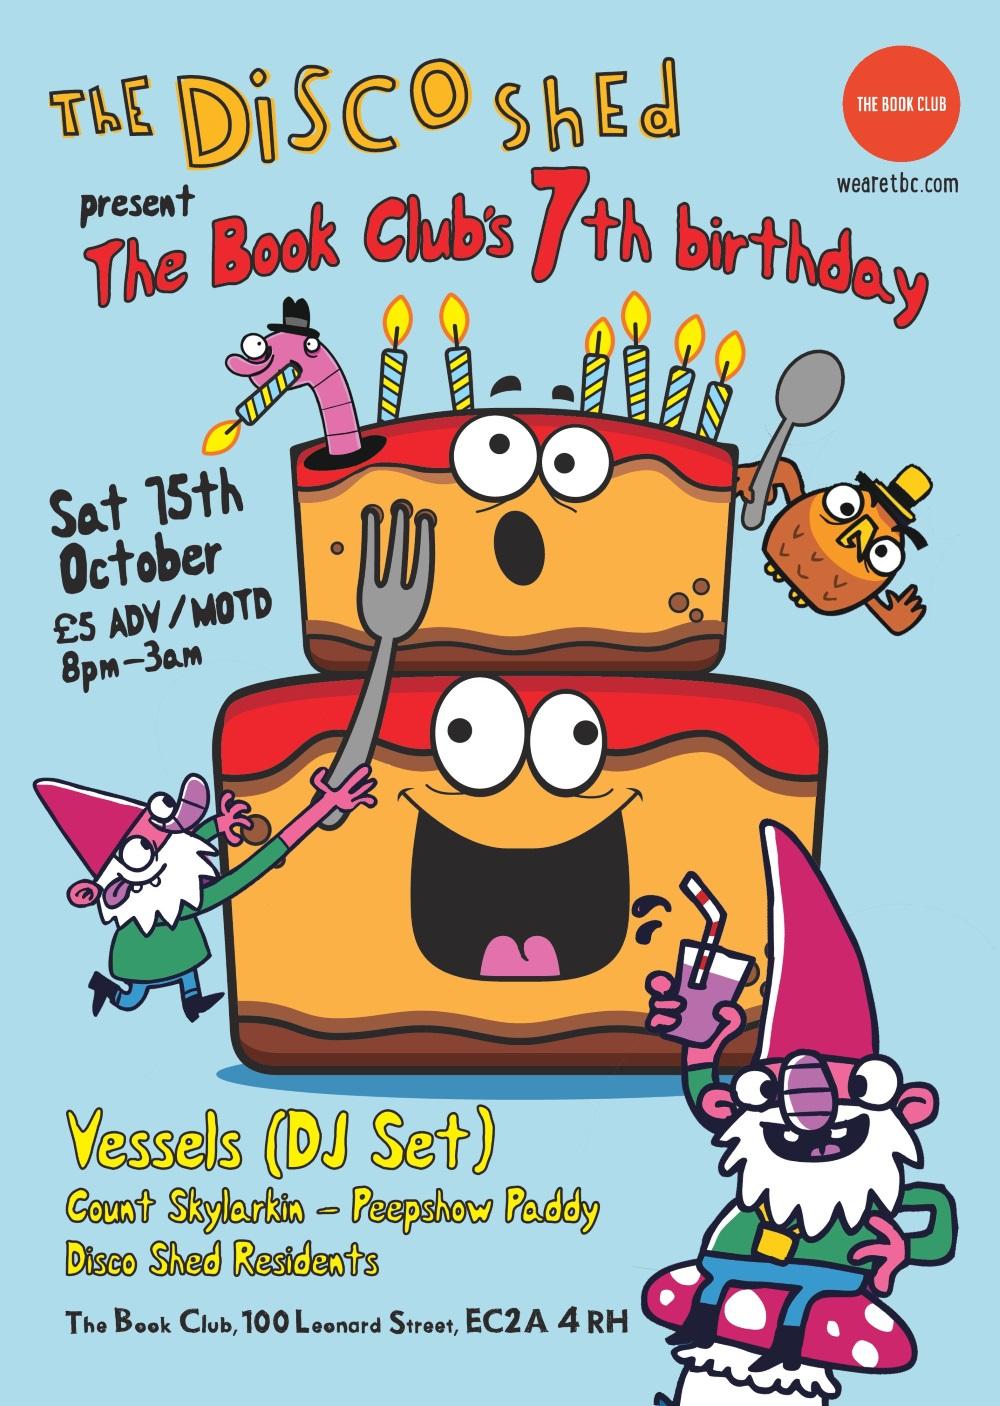 Disco Shed: The Book Club 7th Birthday w/ Vessels (DJ Set)